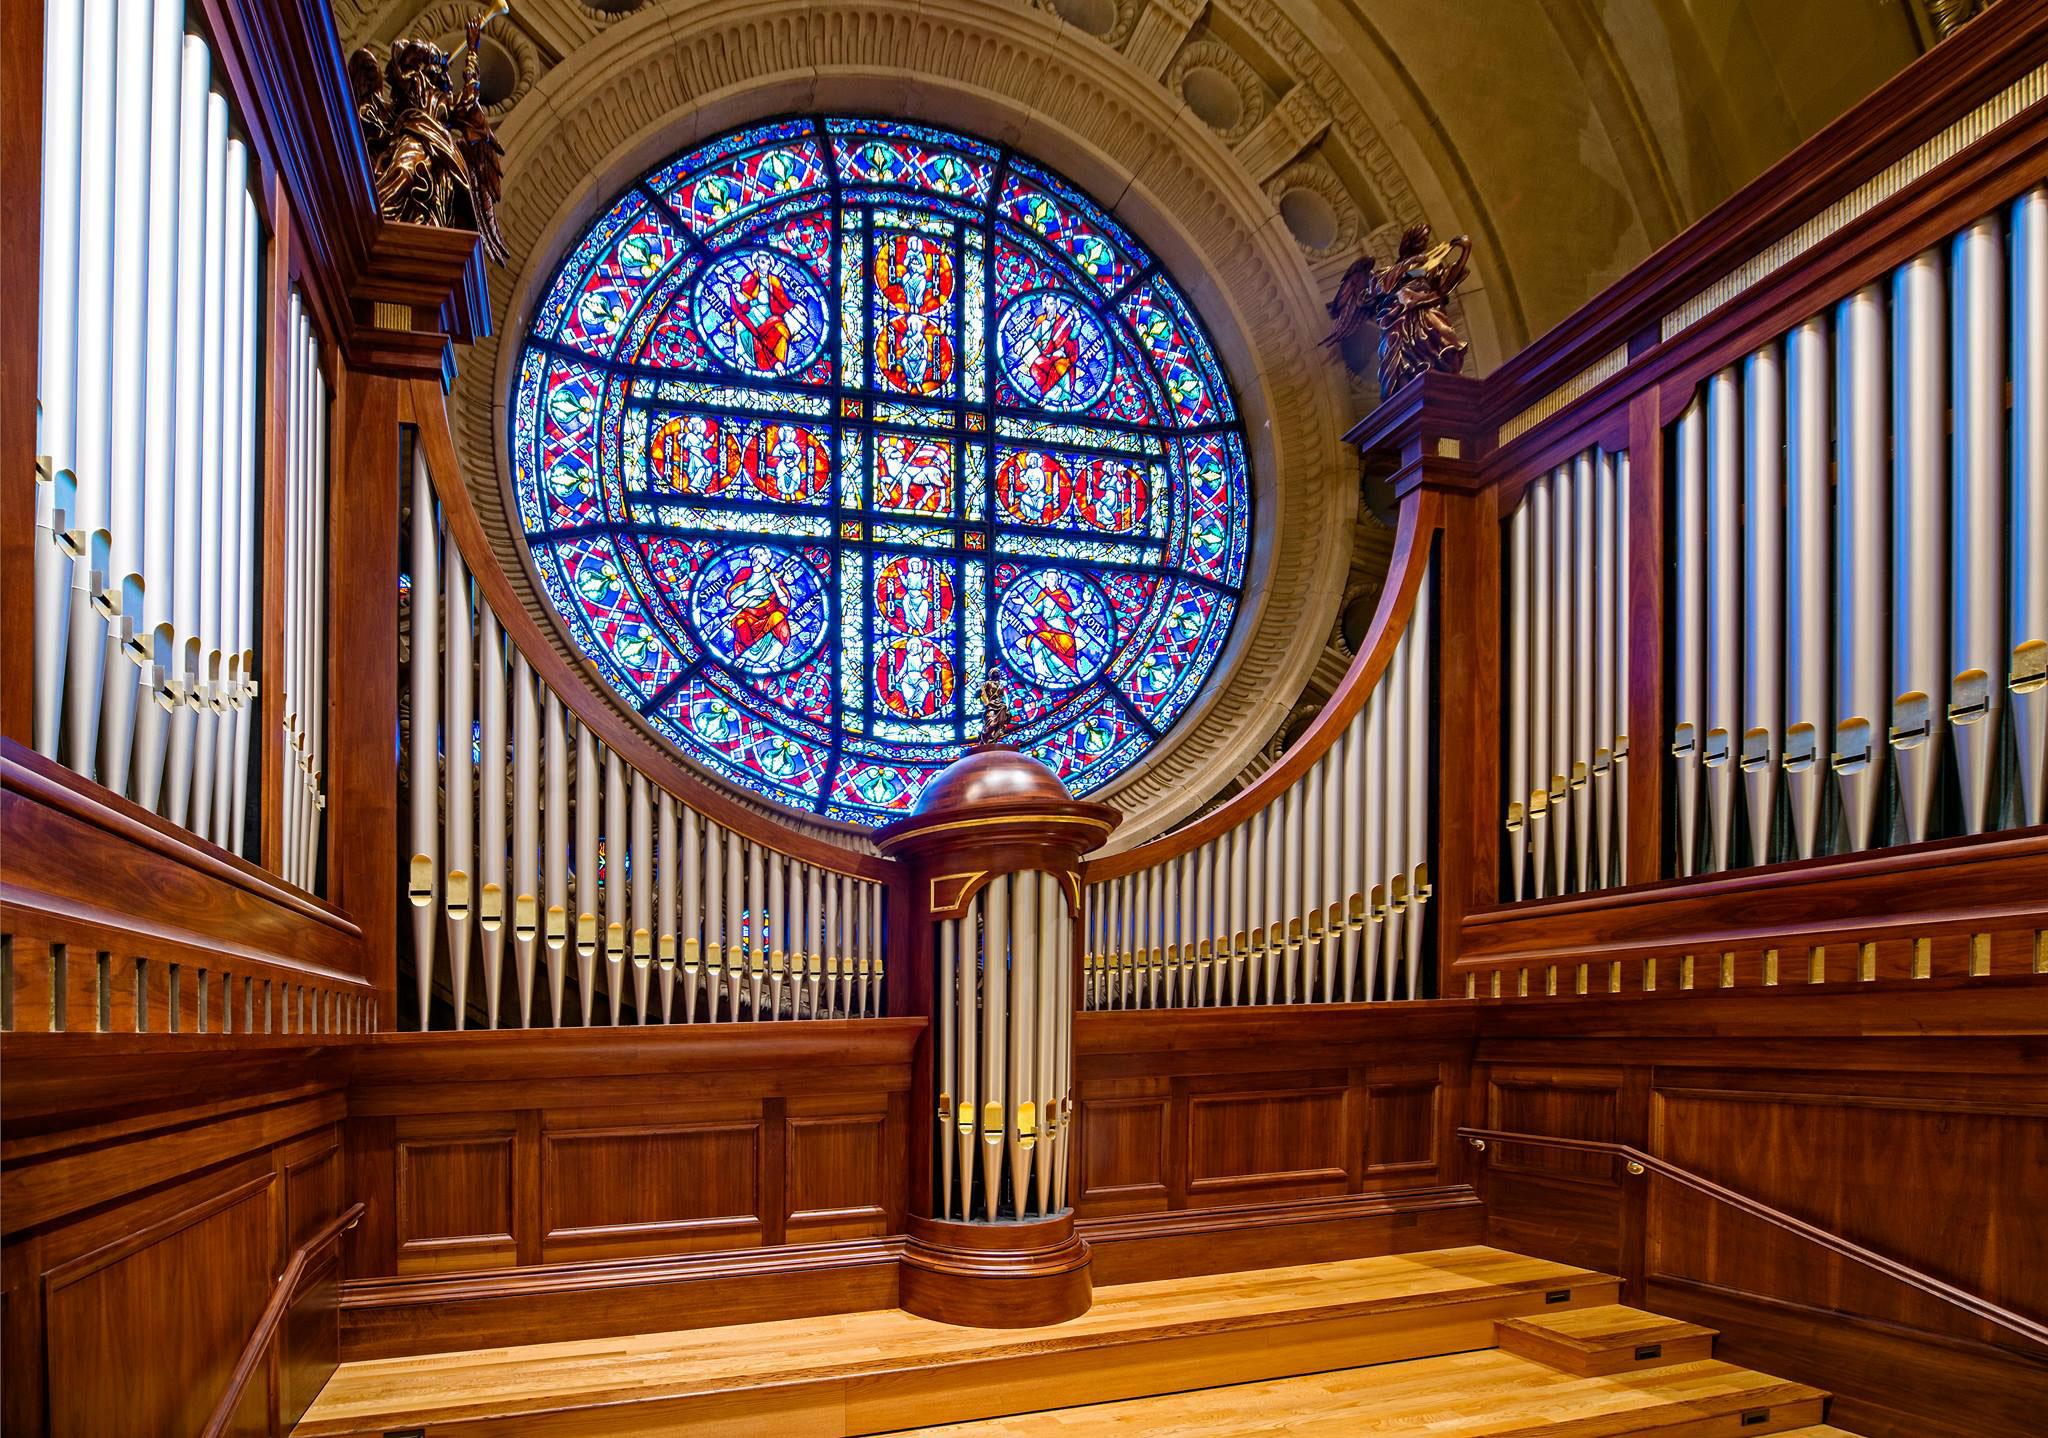 St. Paul Cathedral, St. Paul, MN Organ Case - Joe Hilliard